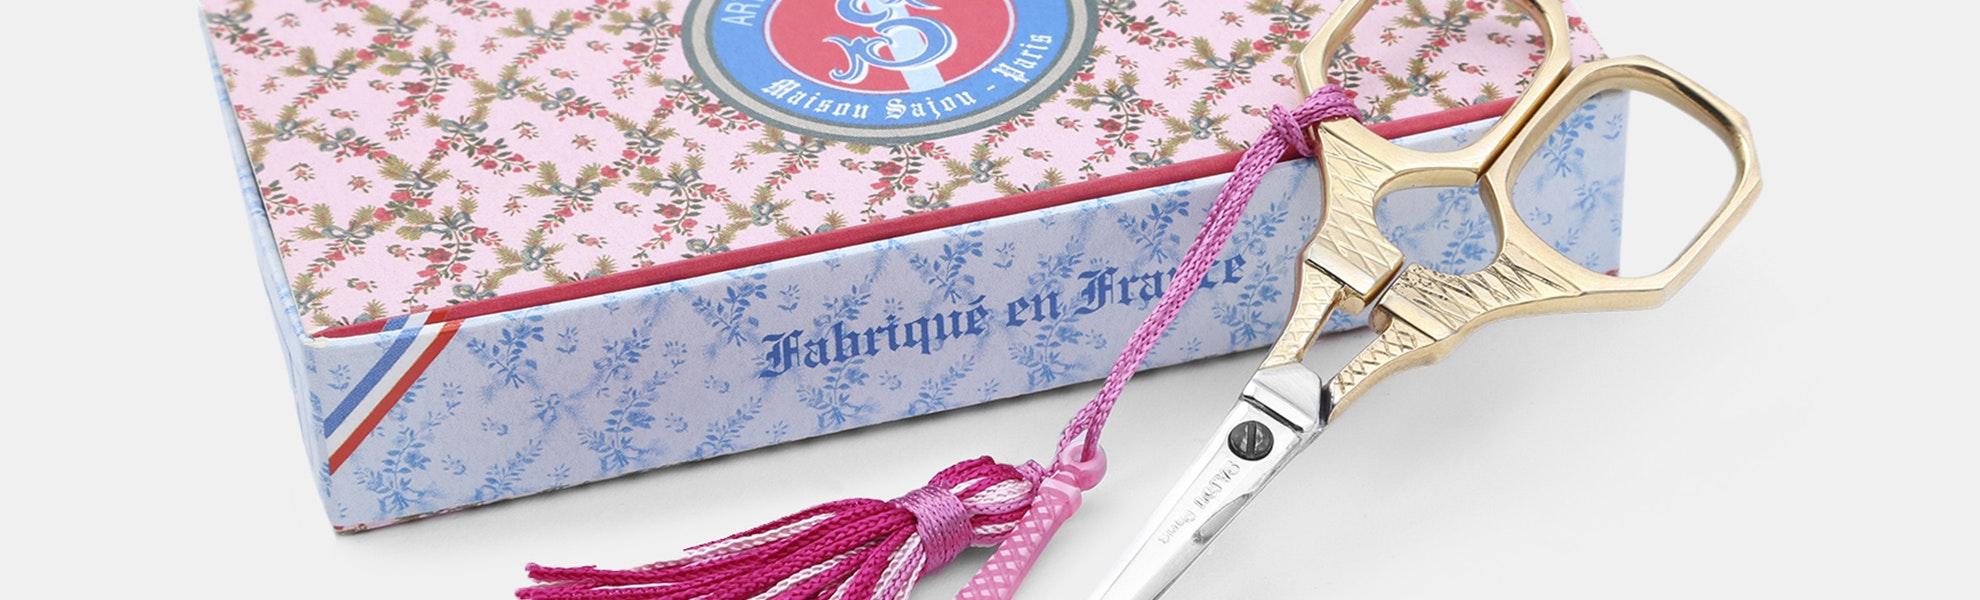 Embroidery Scissors by Maison Sajou